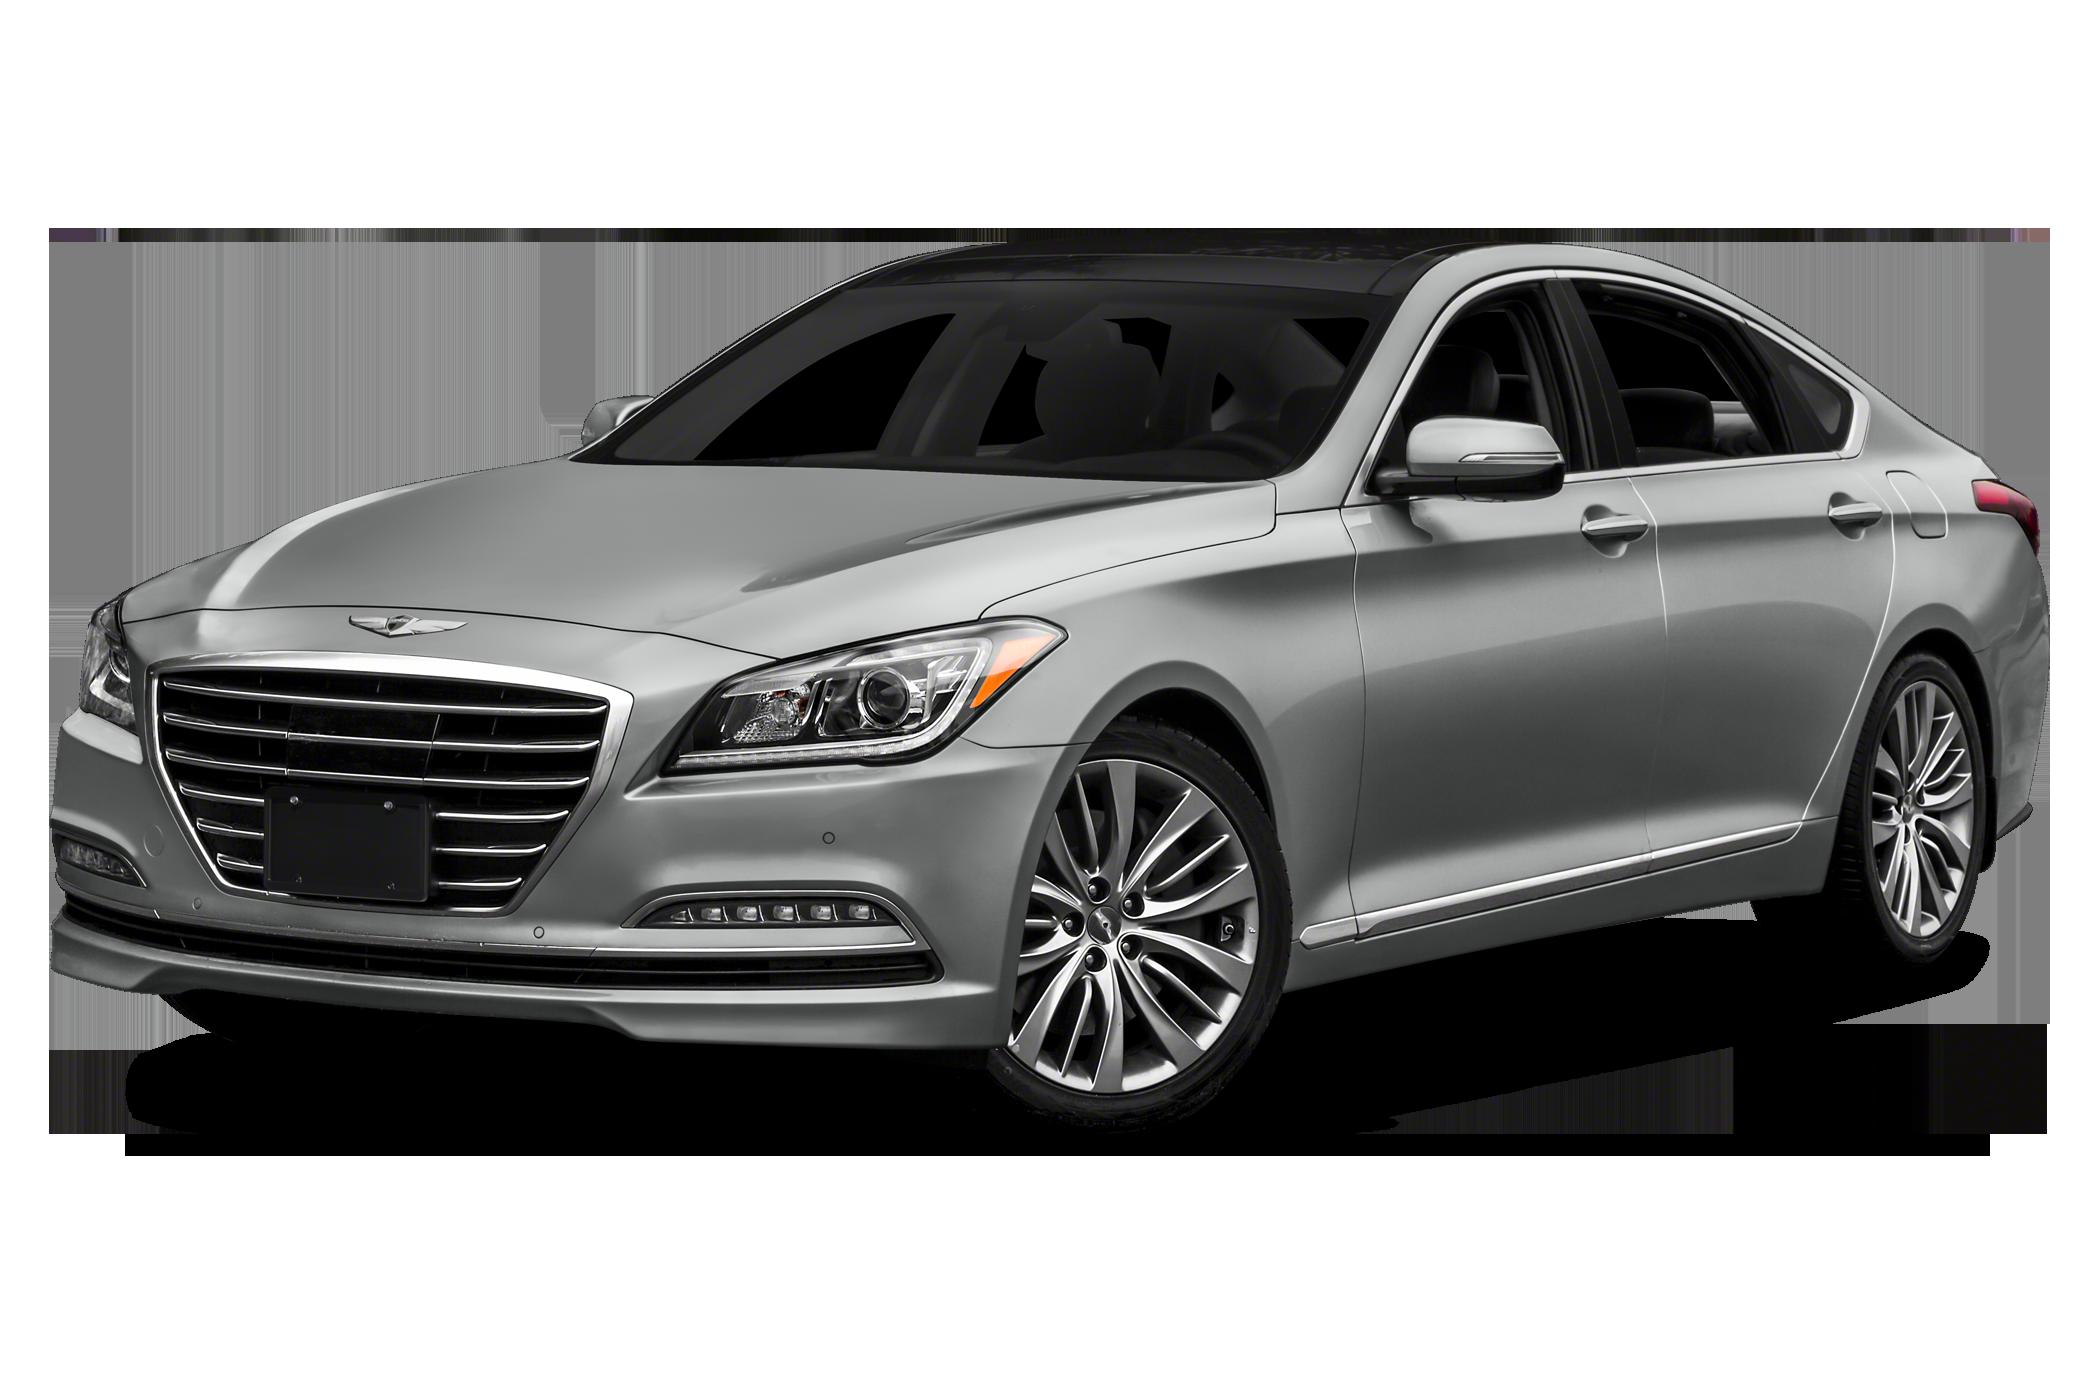 pare Hyundai Genesis sedan to Cadillac Xts